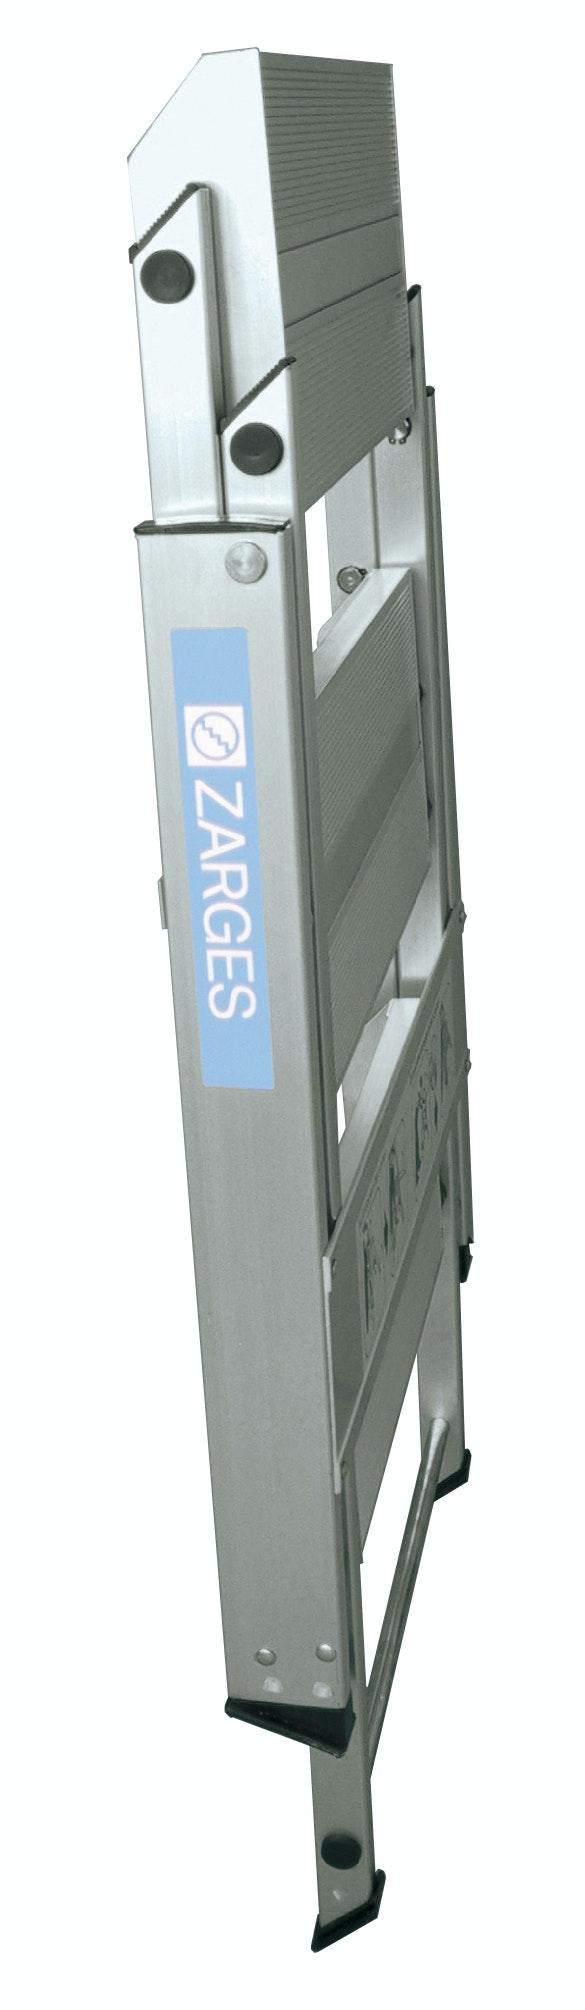 Compactbock Zarges Z500 3-Steg